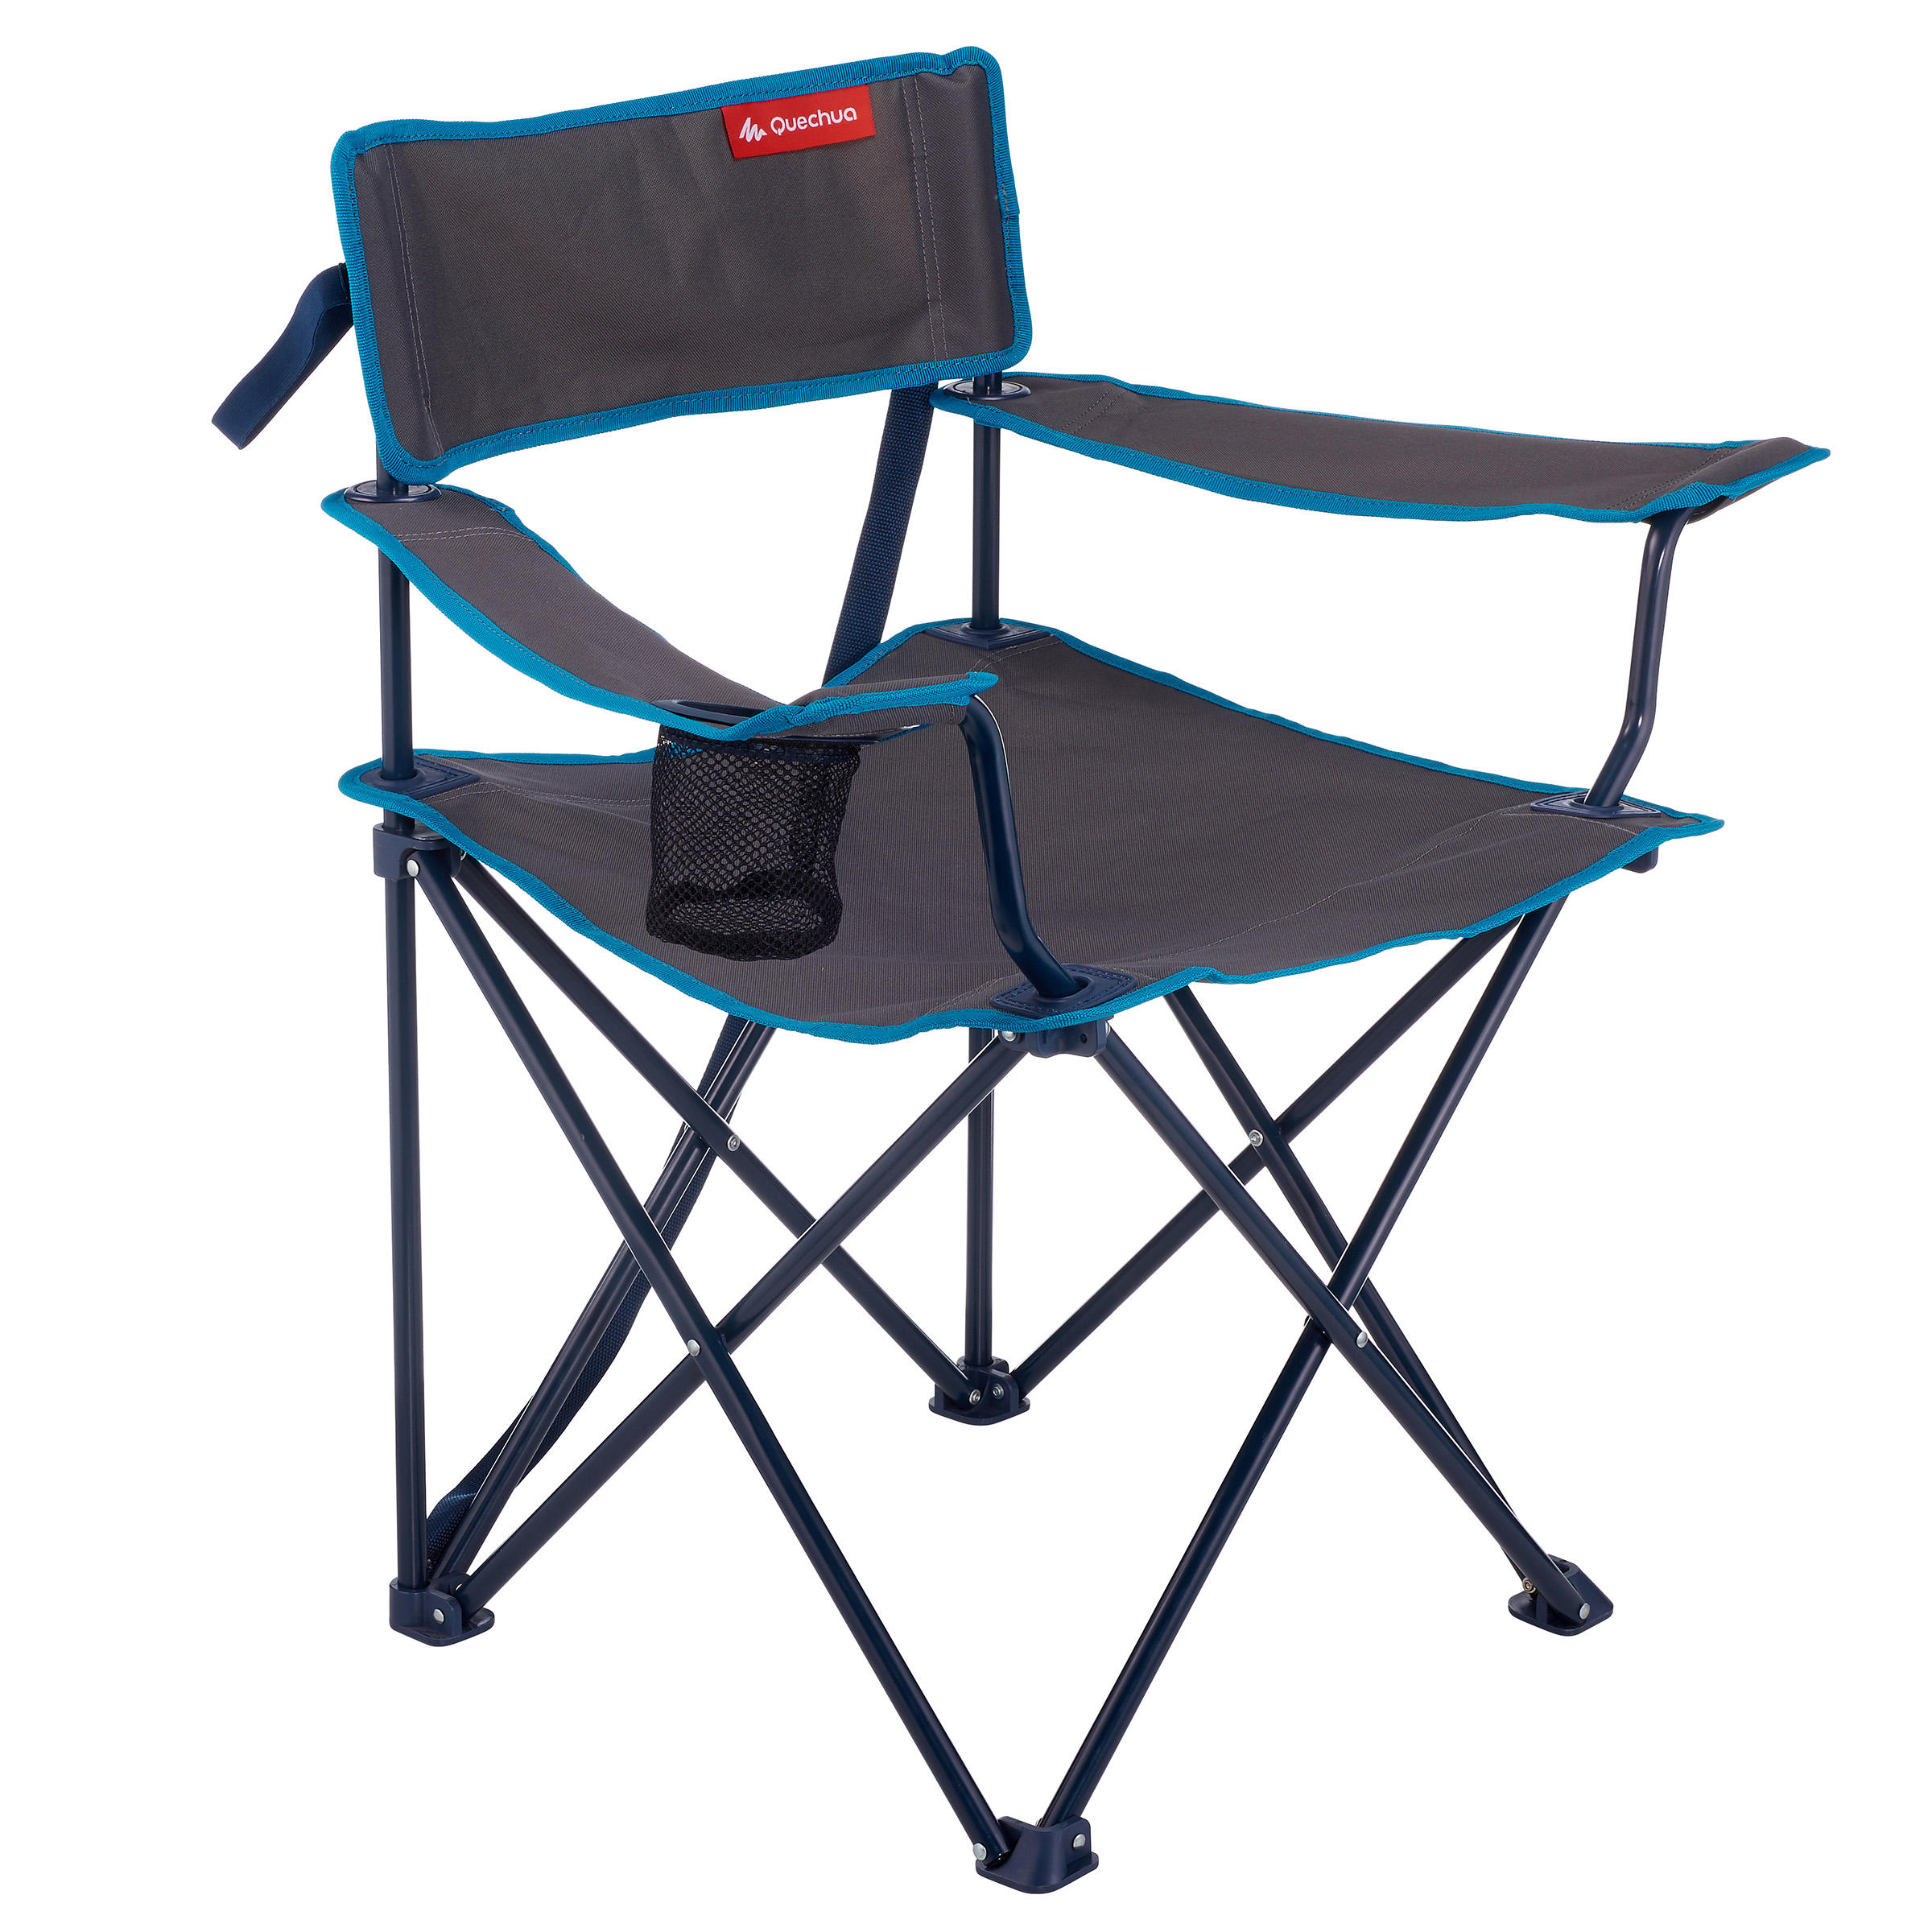 chaise peche decathlon design la maison. Black Bedroom Furniture Sets. Home Design Ideas